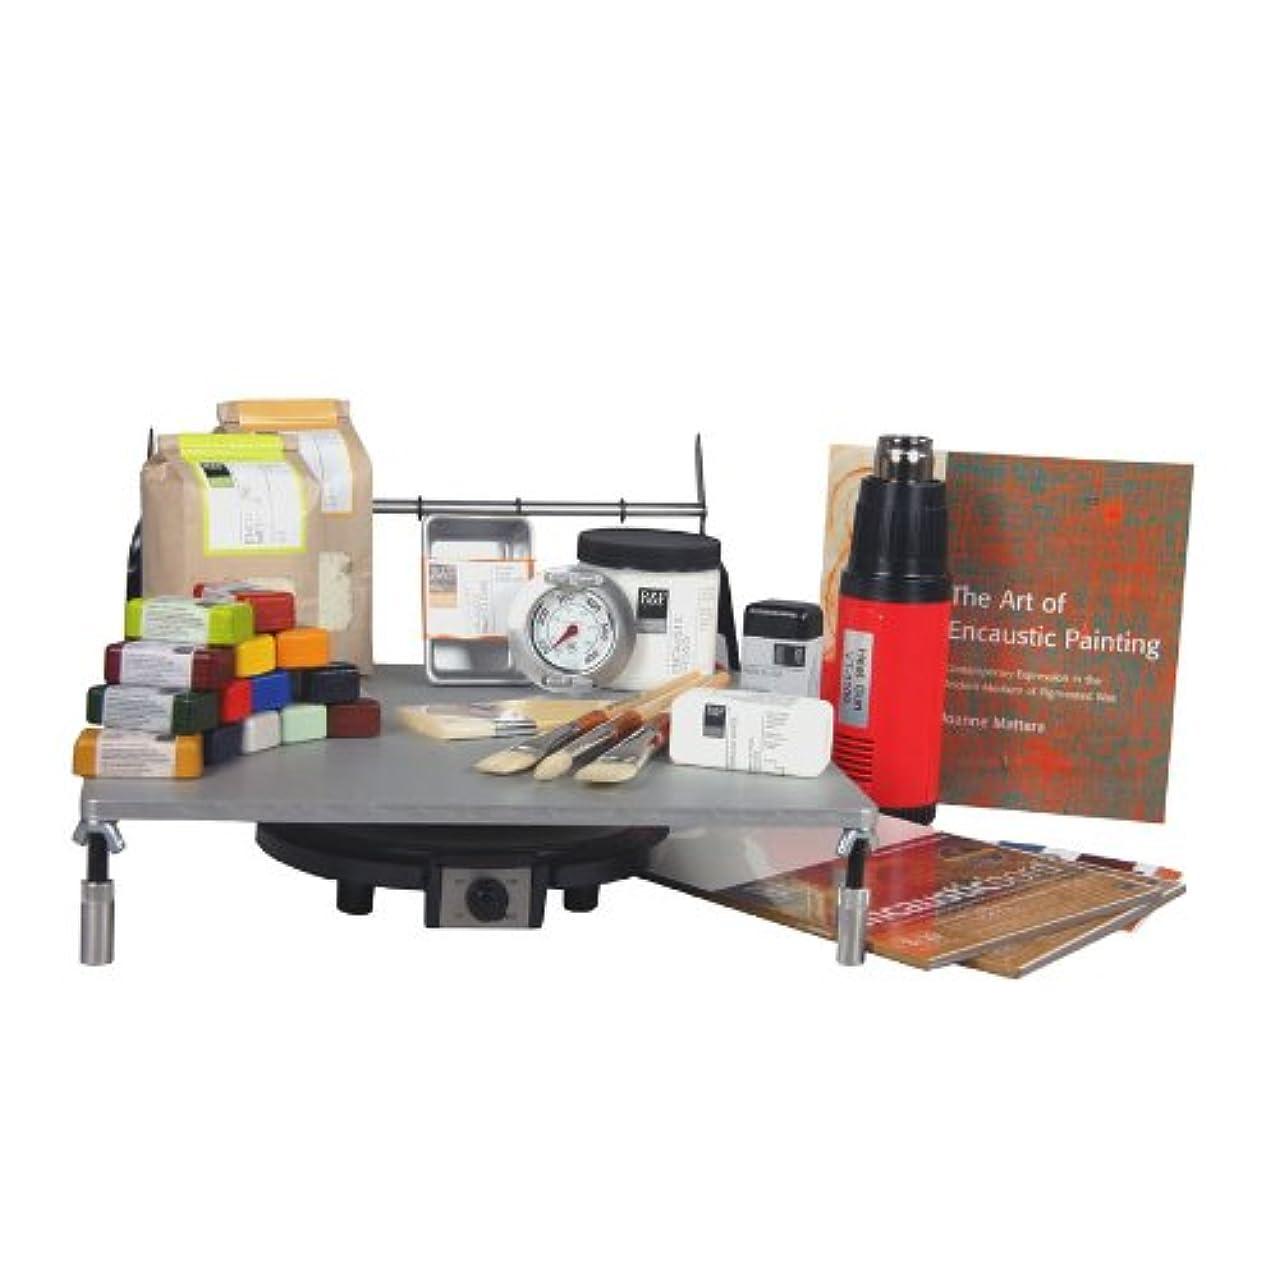 R&F Handmade Paints Encaustic Painting Studio Startup Set